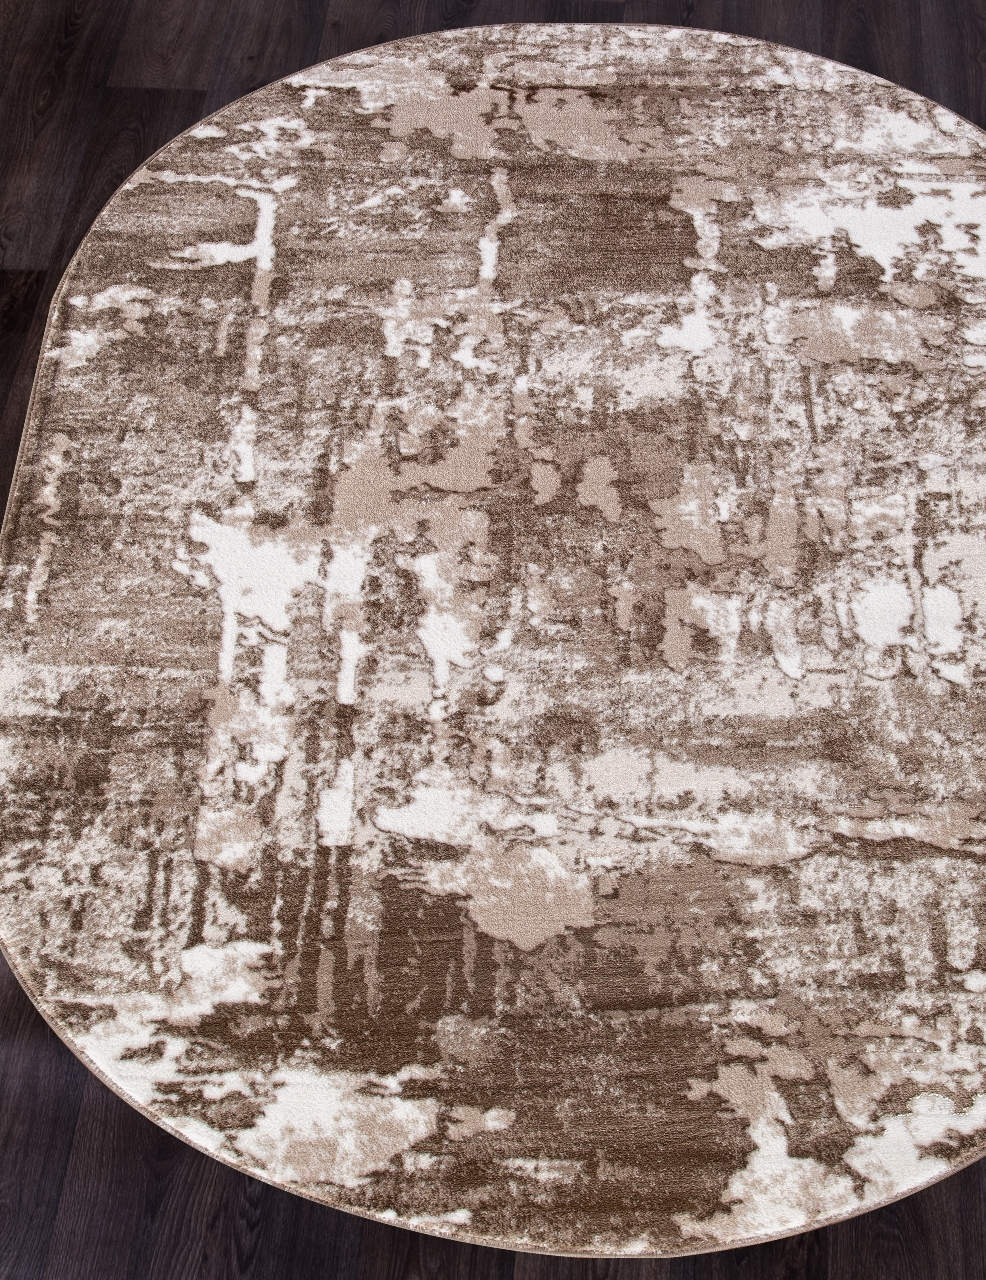 Ковер 5022A - VIZON COKEN / BROWN - Овал - коллекция MARDAN